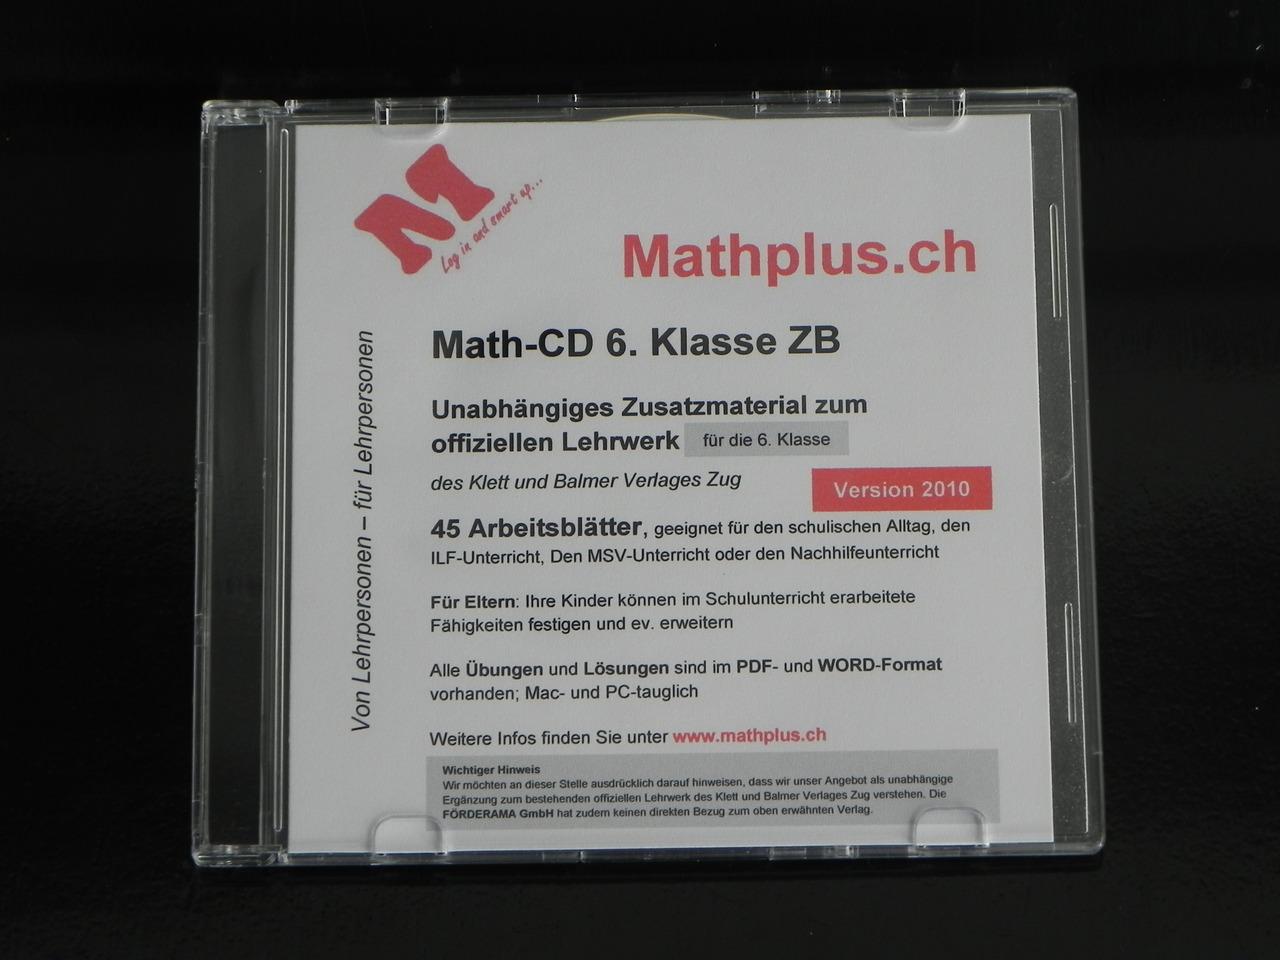 MATHPLUS - LehrmittelPLUS - Lehrmaterial für die Praxis